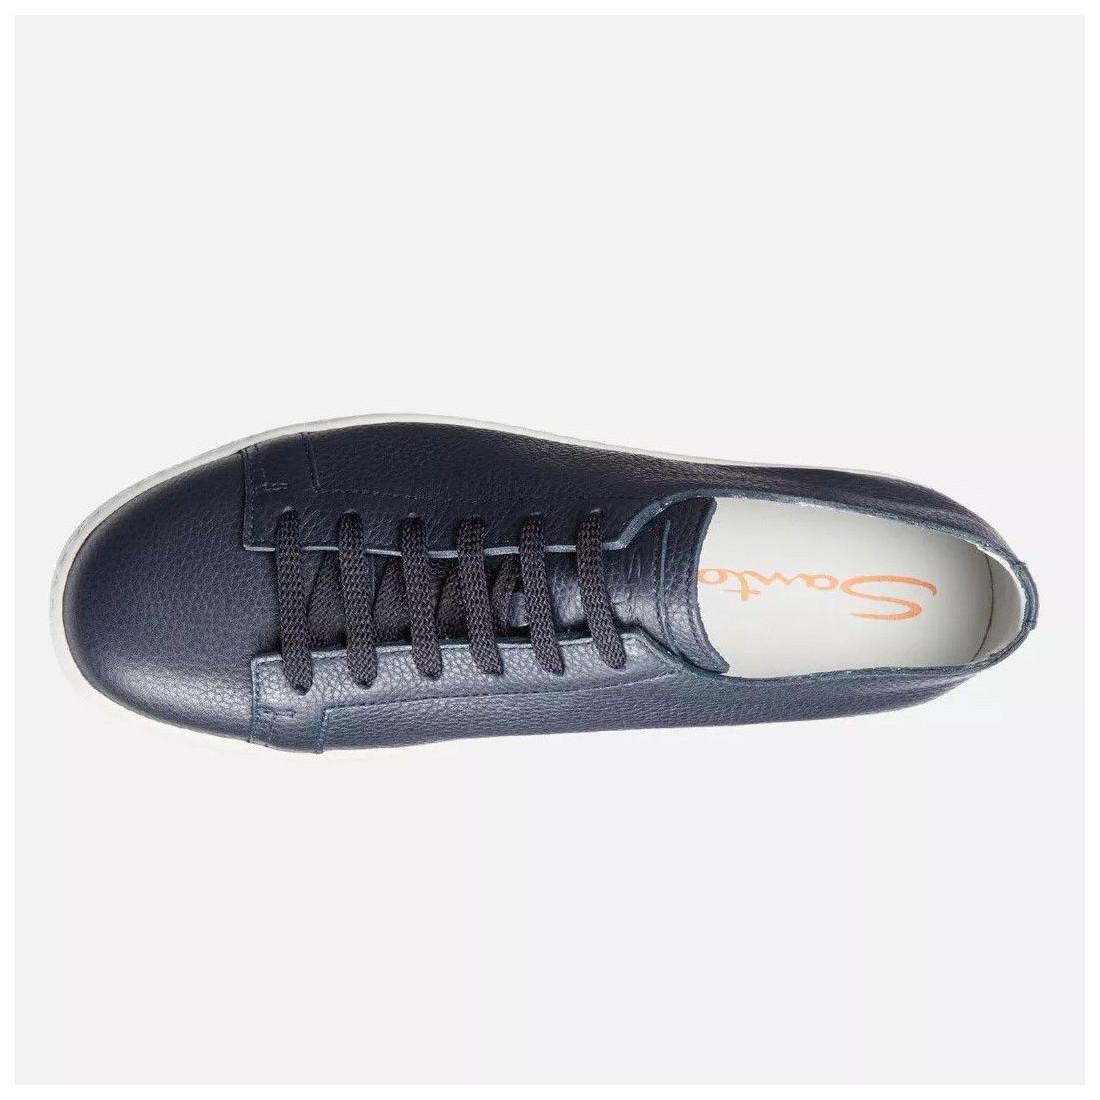 sneakers man santoni mbcn14387barcmiau55summer u55 7303